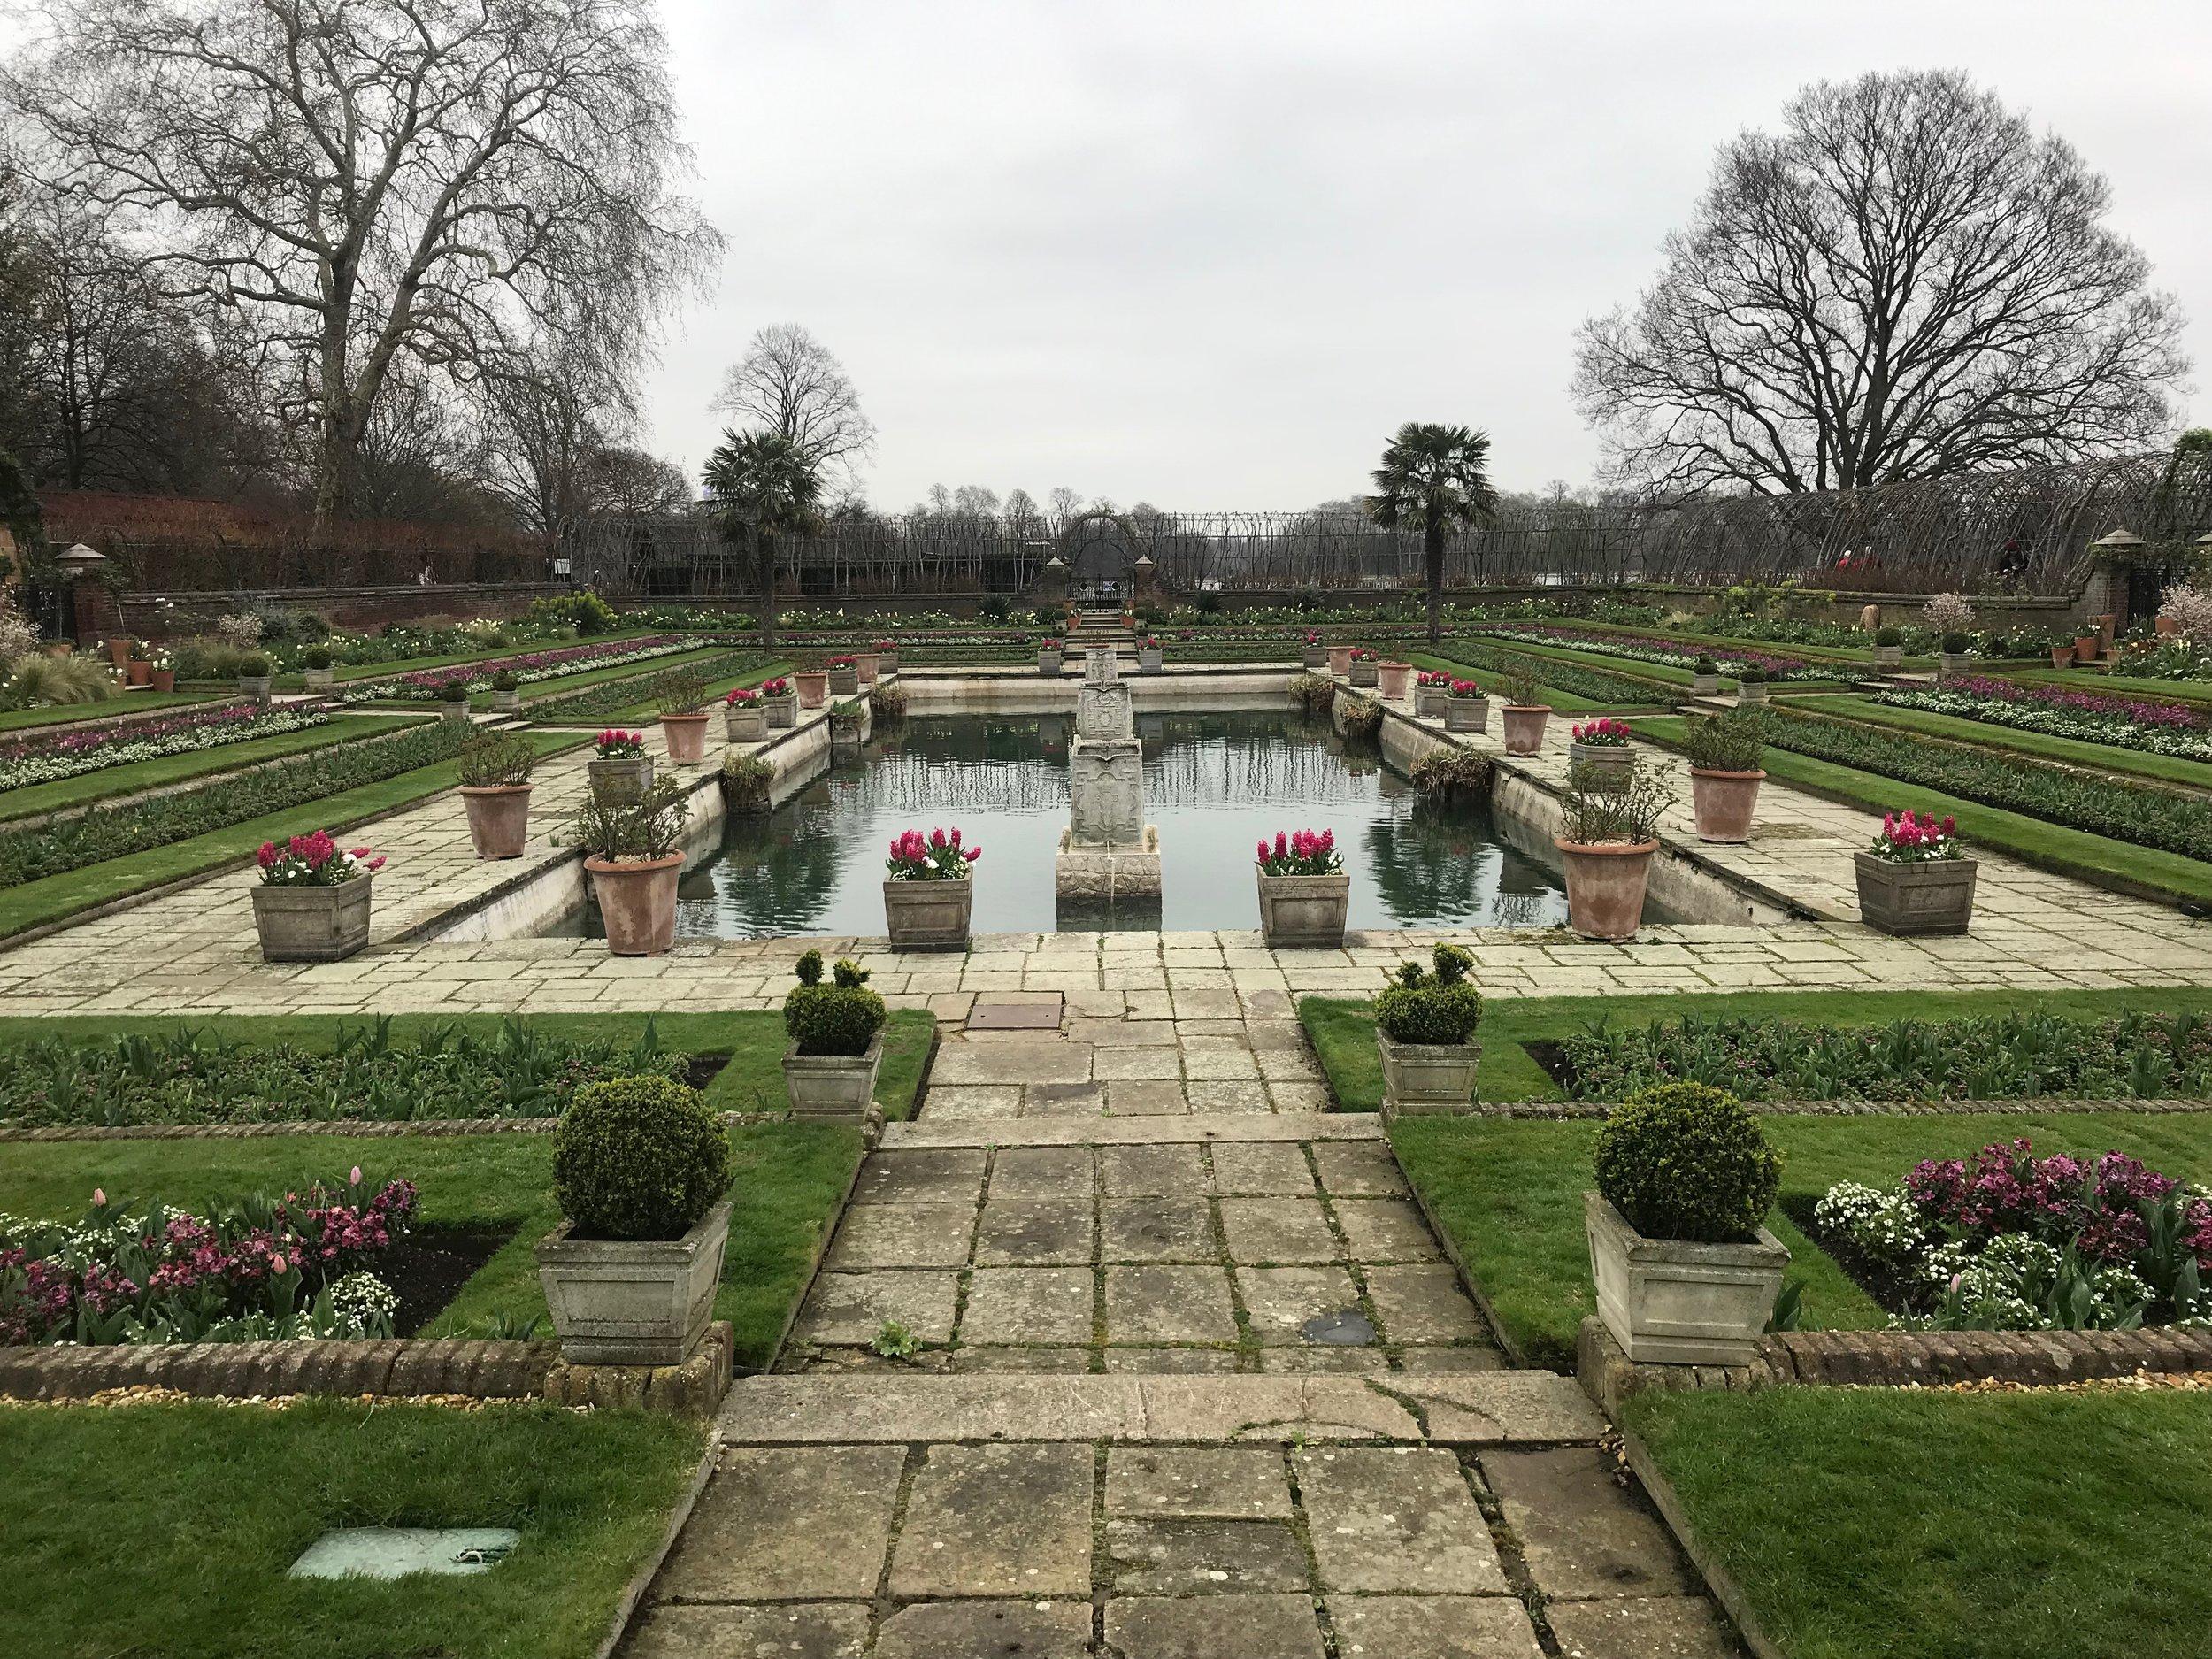 Visit London - The Sunken Garden at Kensington Palace